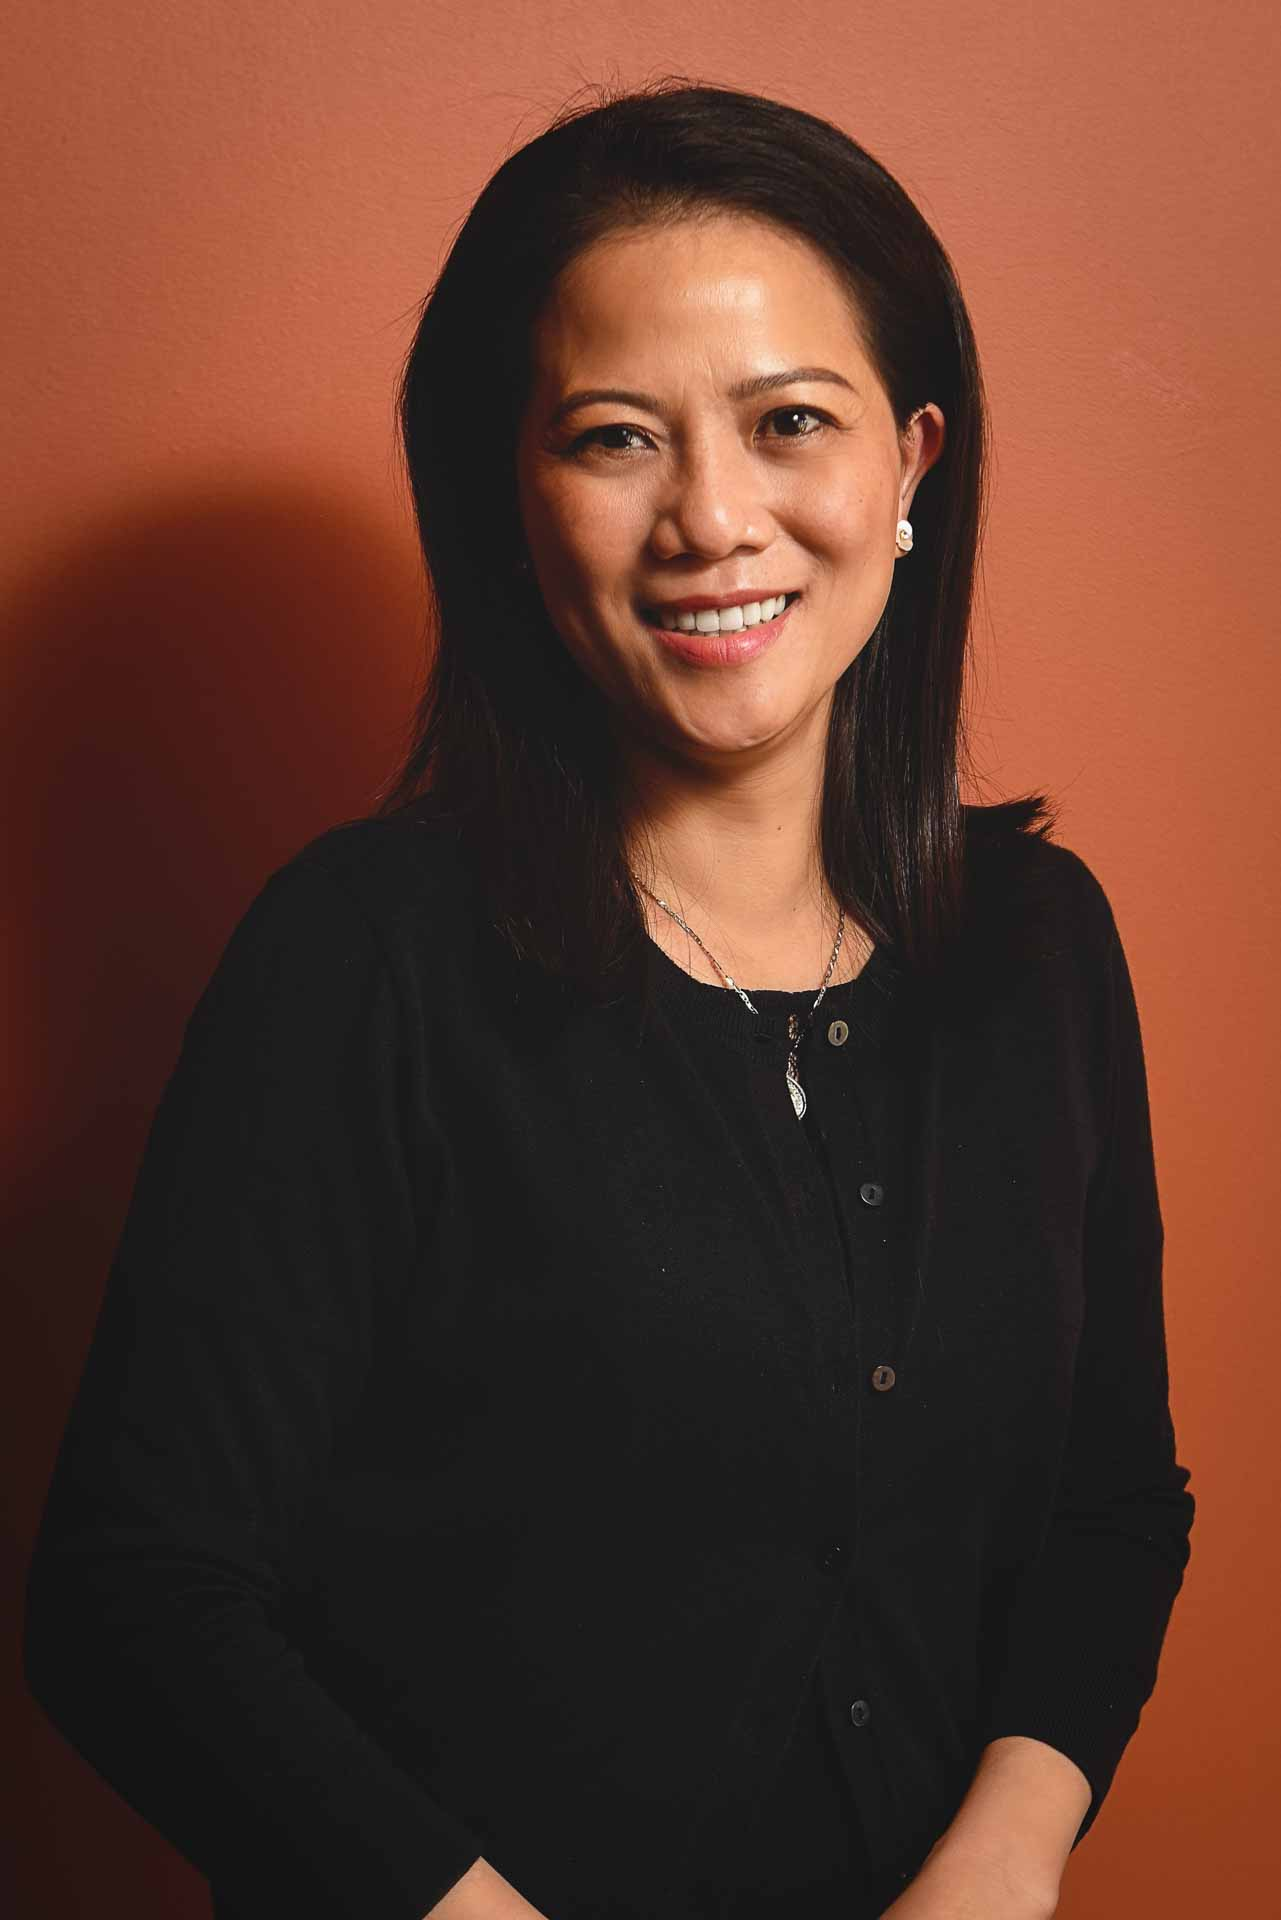 Hang | East Dental Care | SE Calgary Dentist | Finance Coordinator